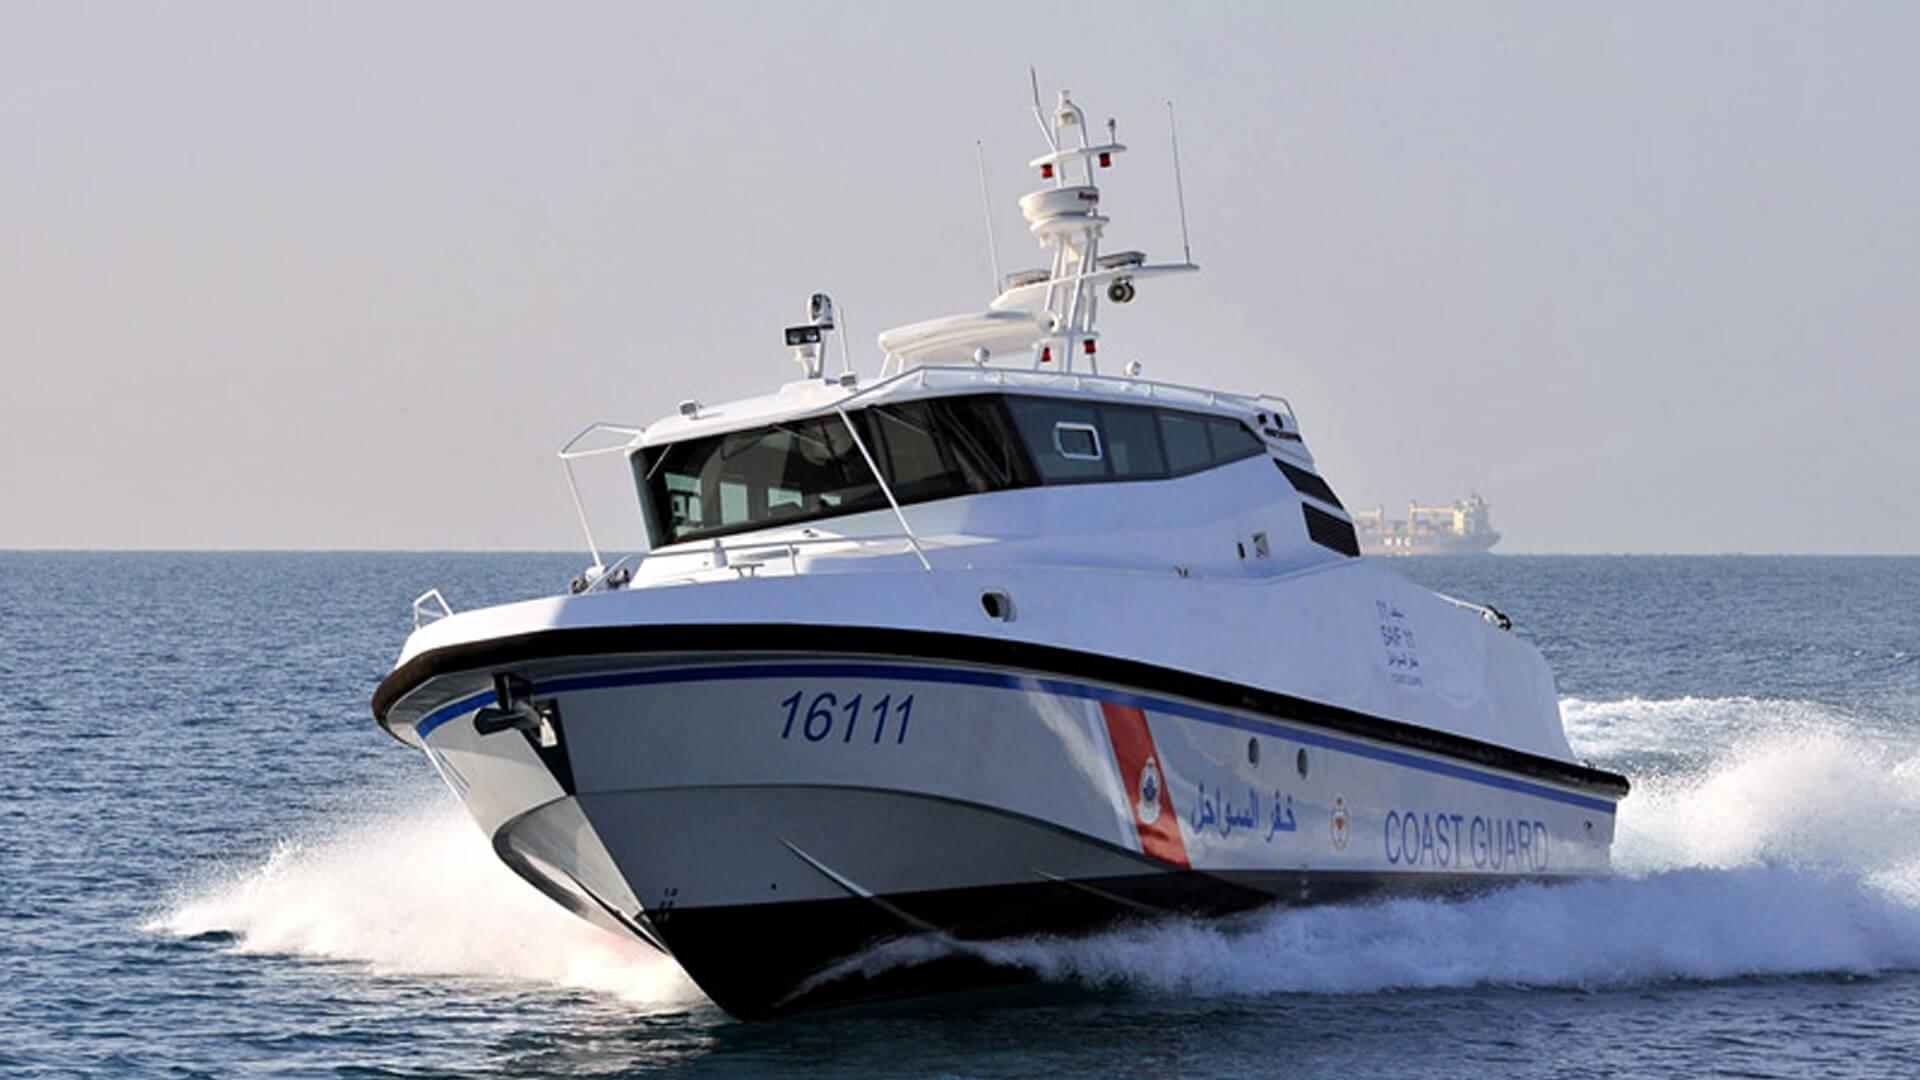 images/vessels/01-patrol-craft/05-series-fpb/03-ares-58-fpb/01.jpg